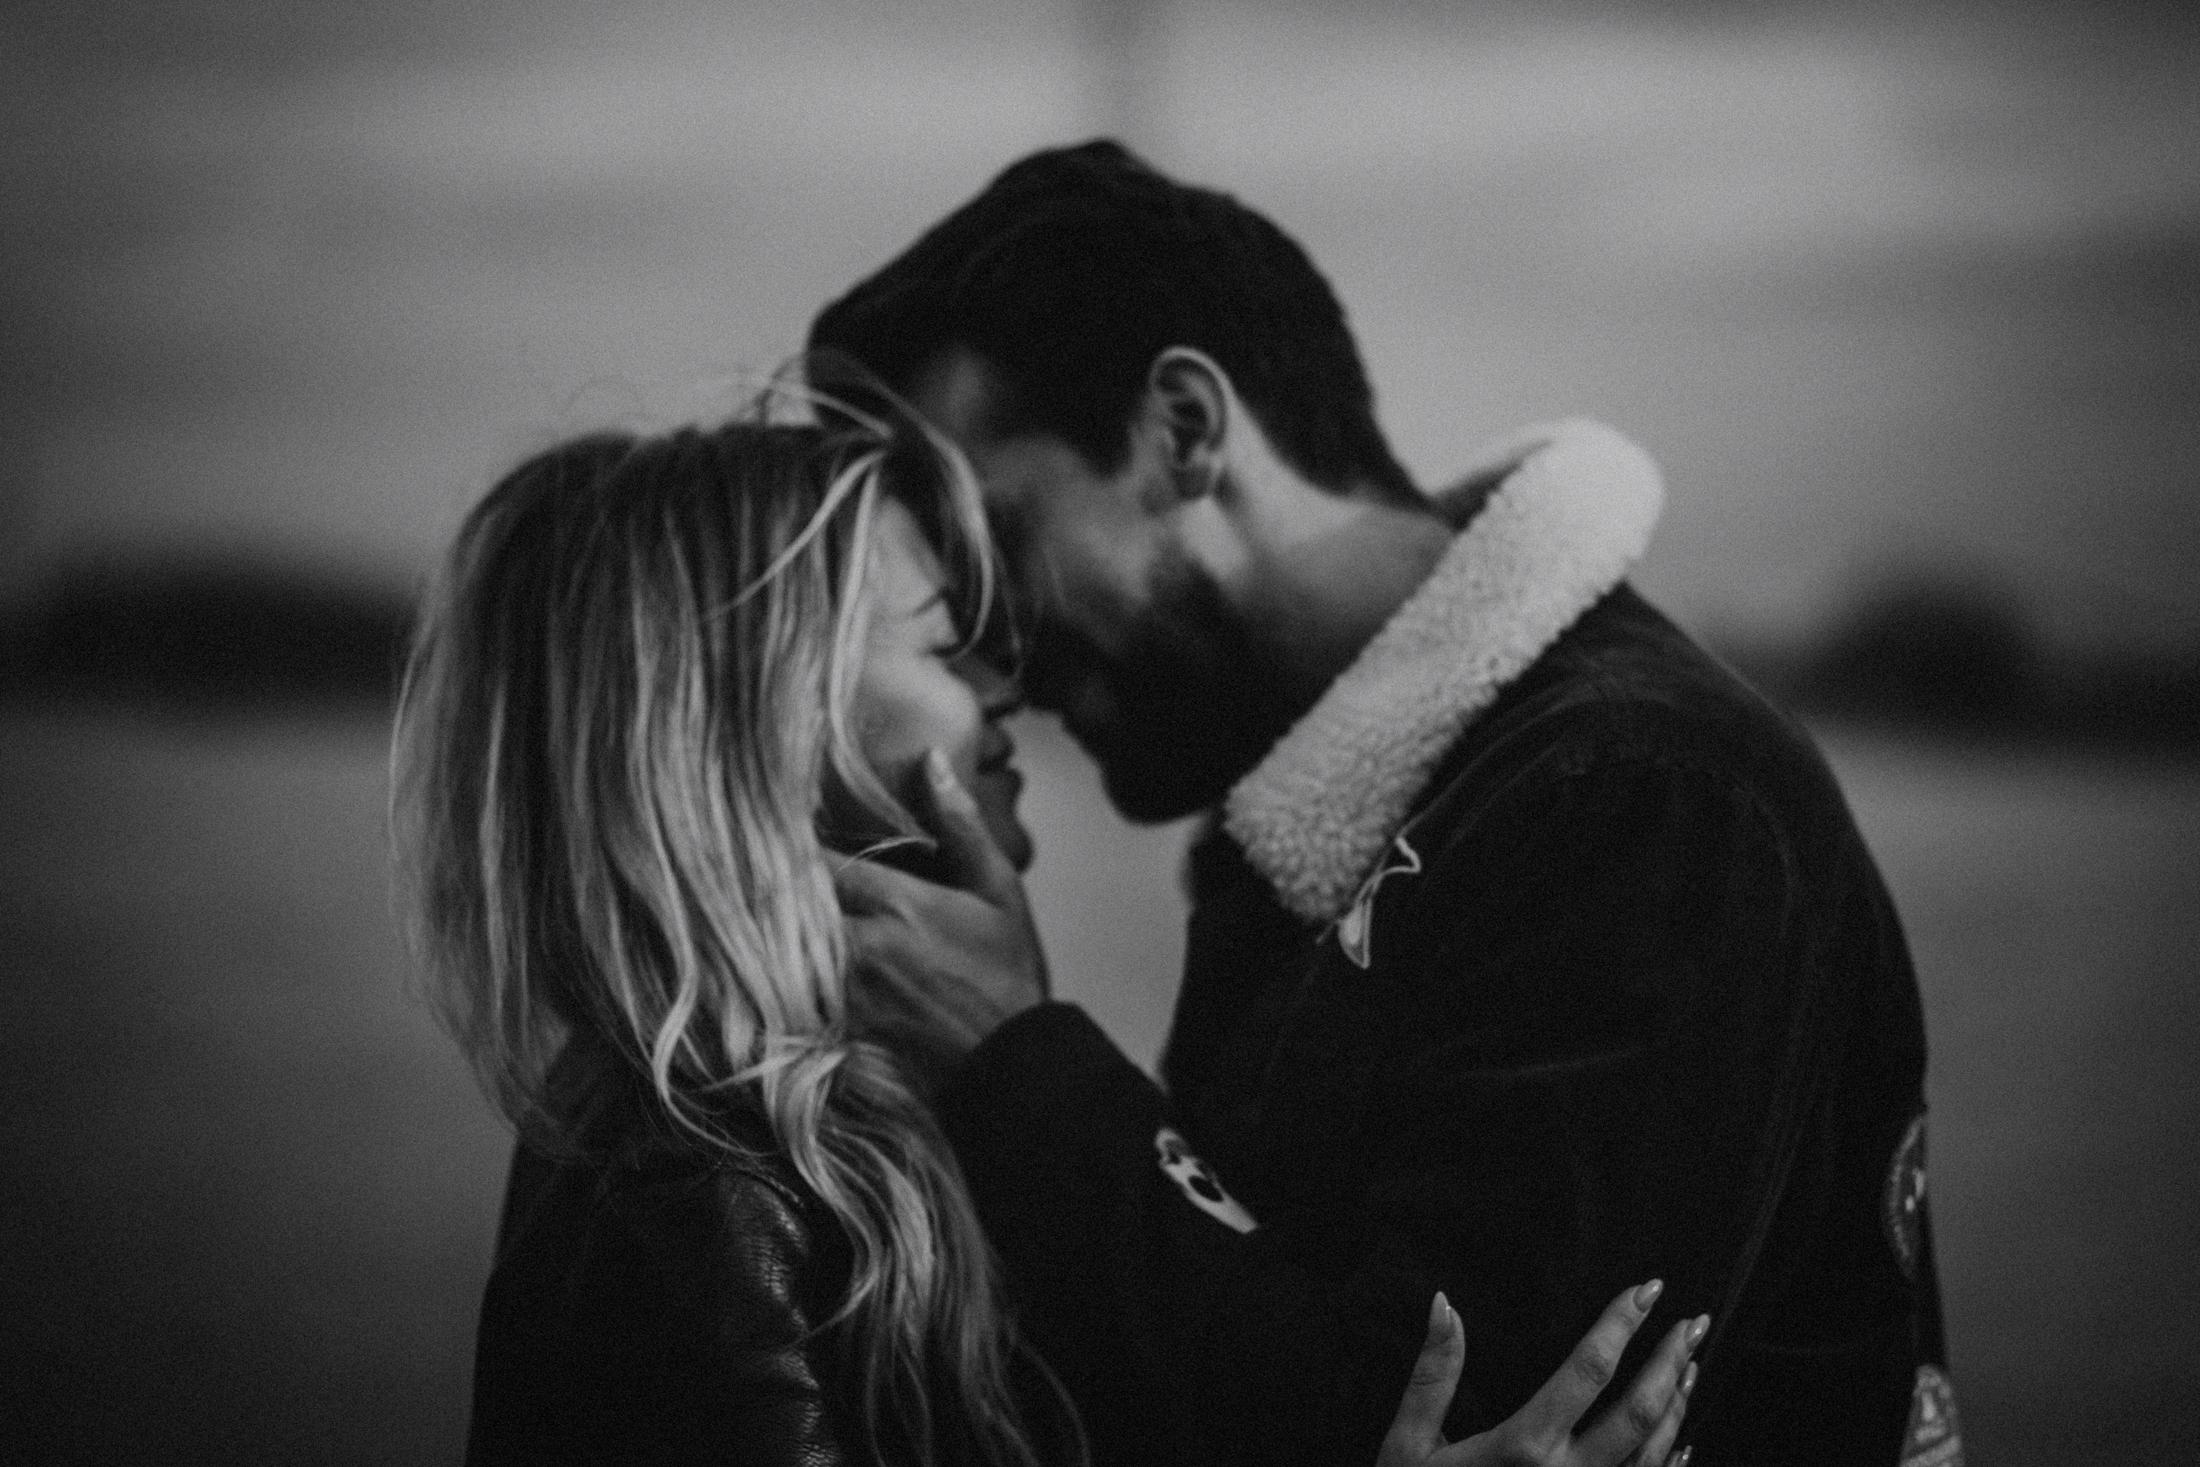 Wedding_Photographer_Mallorca_DanielaMarquardt_Photography_CanaryIslands_Lanzarote_Iceland_Tuscany_Santorini_Portugal_NewYork_Spain_Elopement_Hochzeitsfotograf_CK19